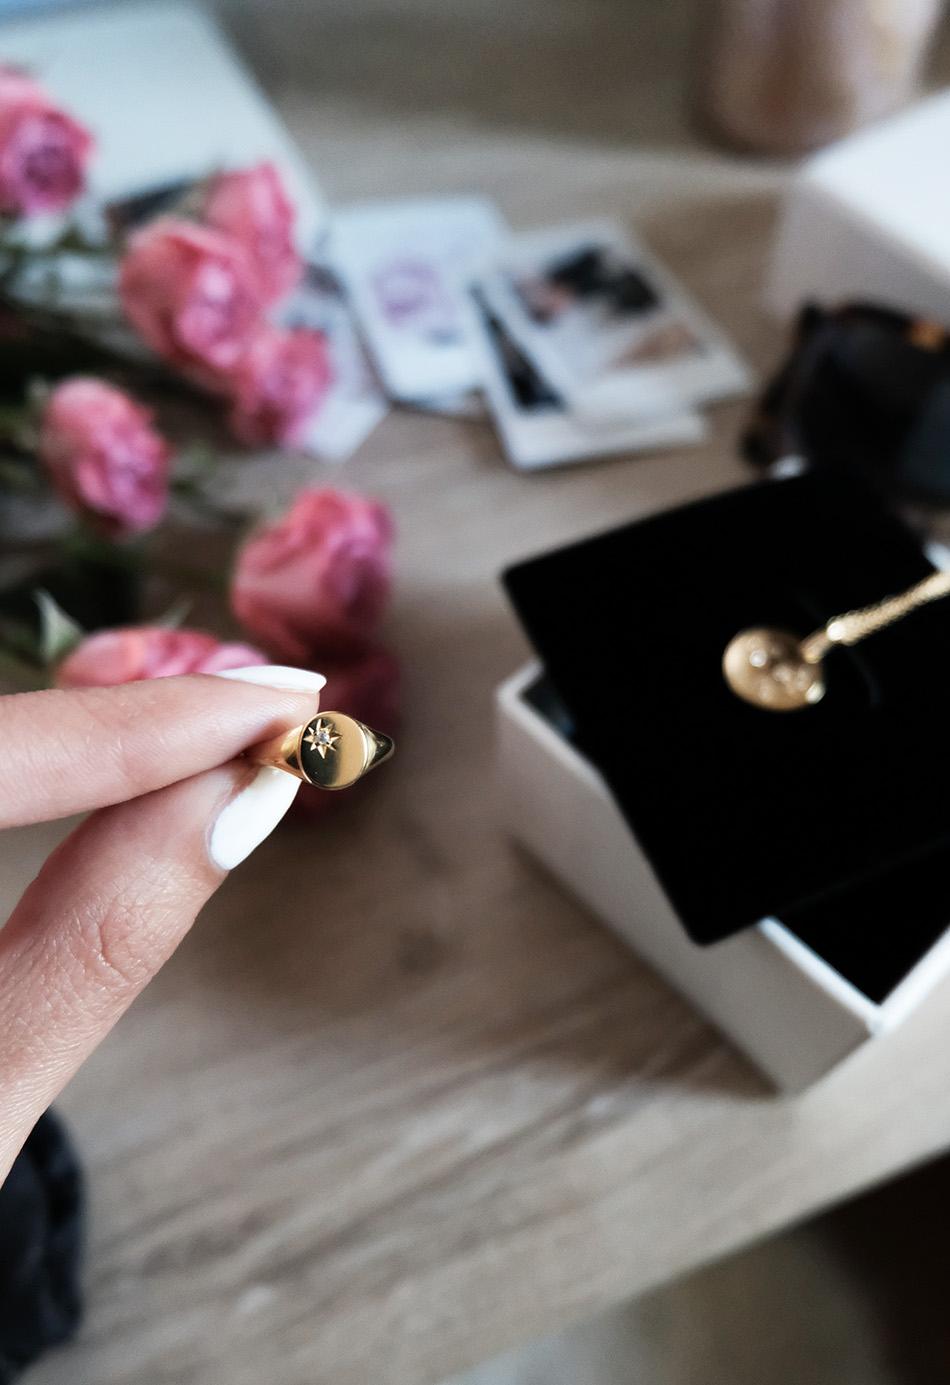 star signet ring | mejuri pinky ring review